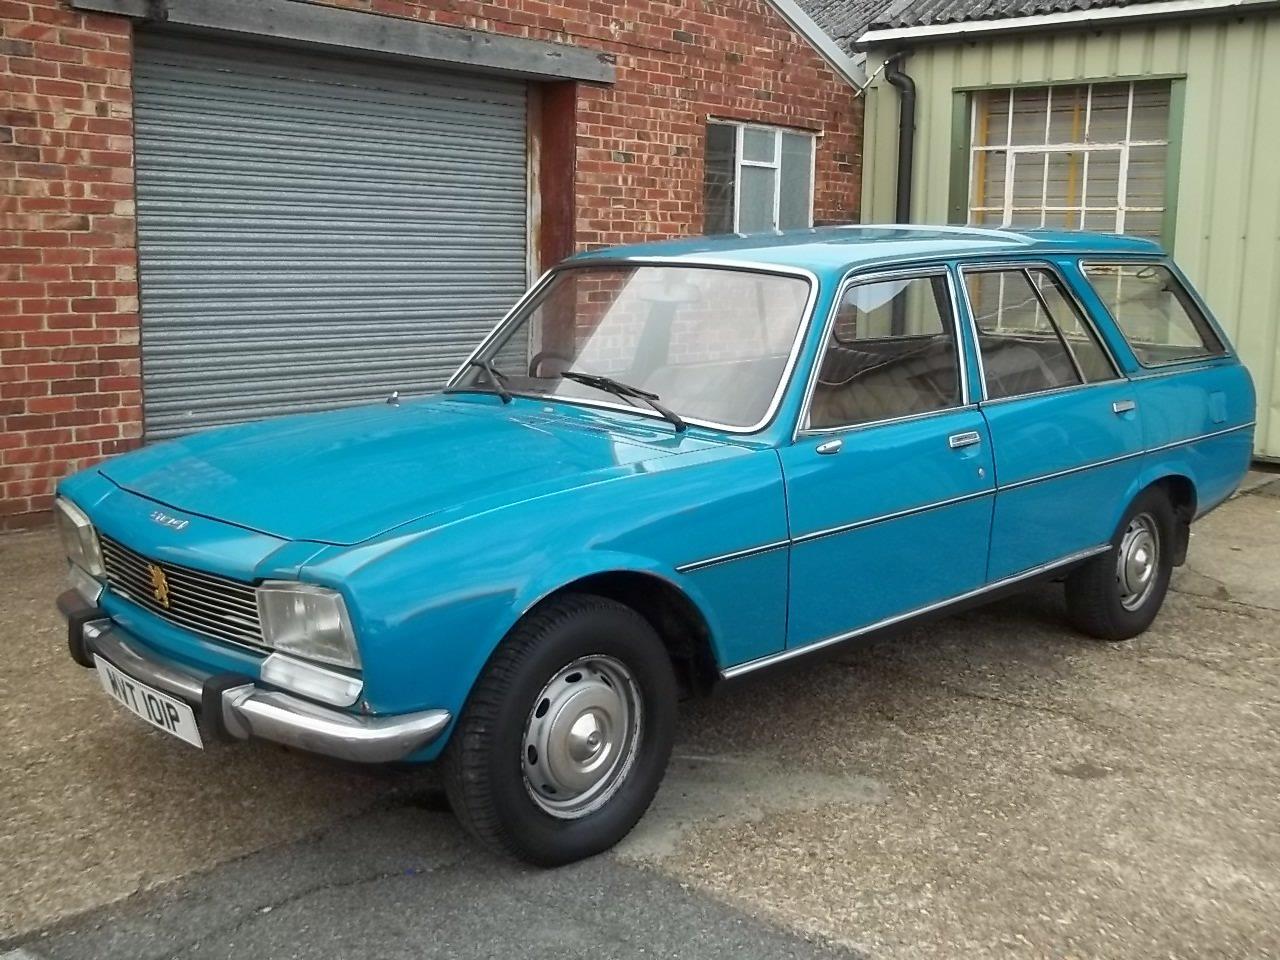 1976 Peugeot 504 2.0 Family Supplying Dealer + 1 owner SOLD (picture 1 of 6)